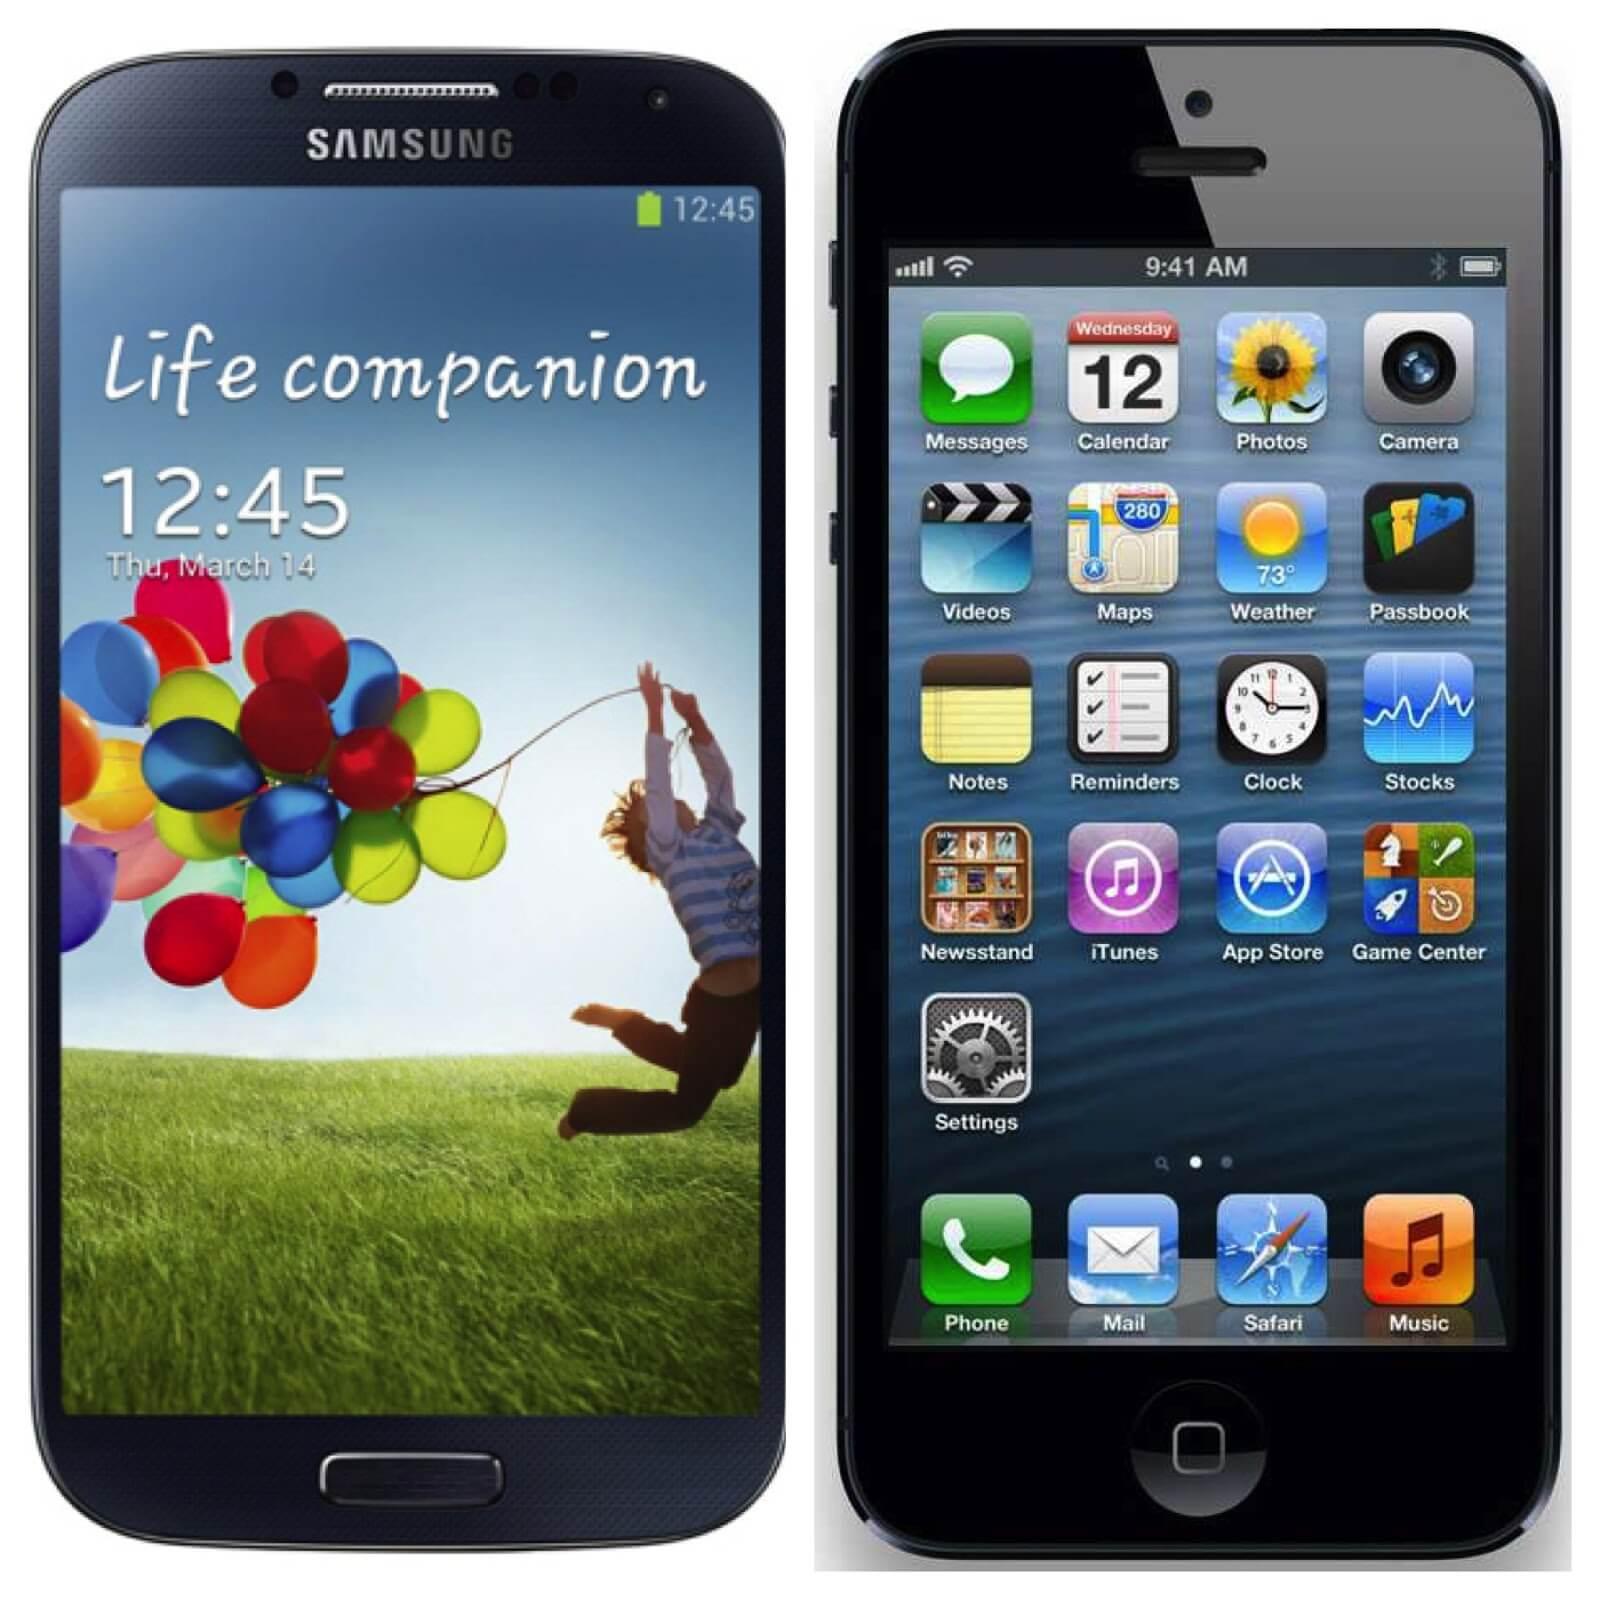 samsung galaxy s4 vs apple iphone 5